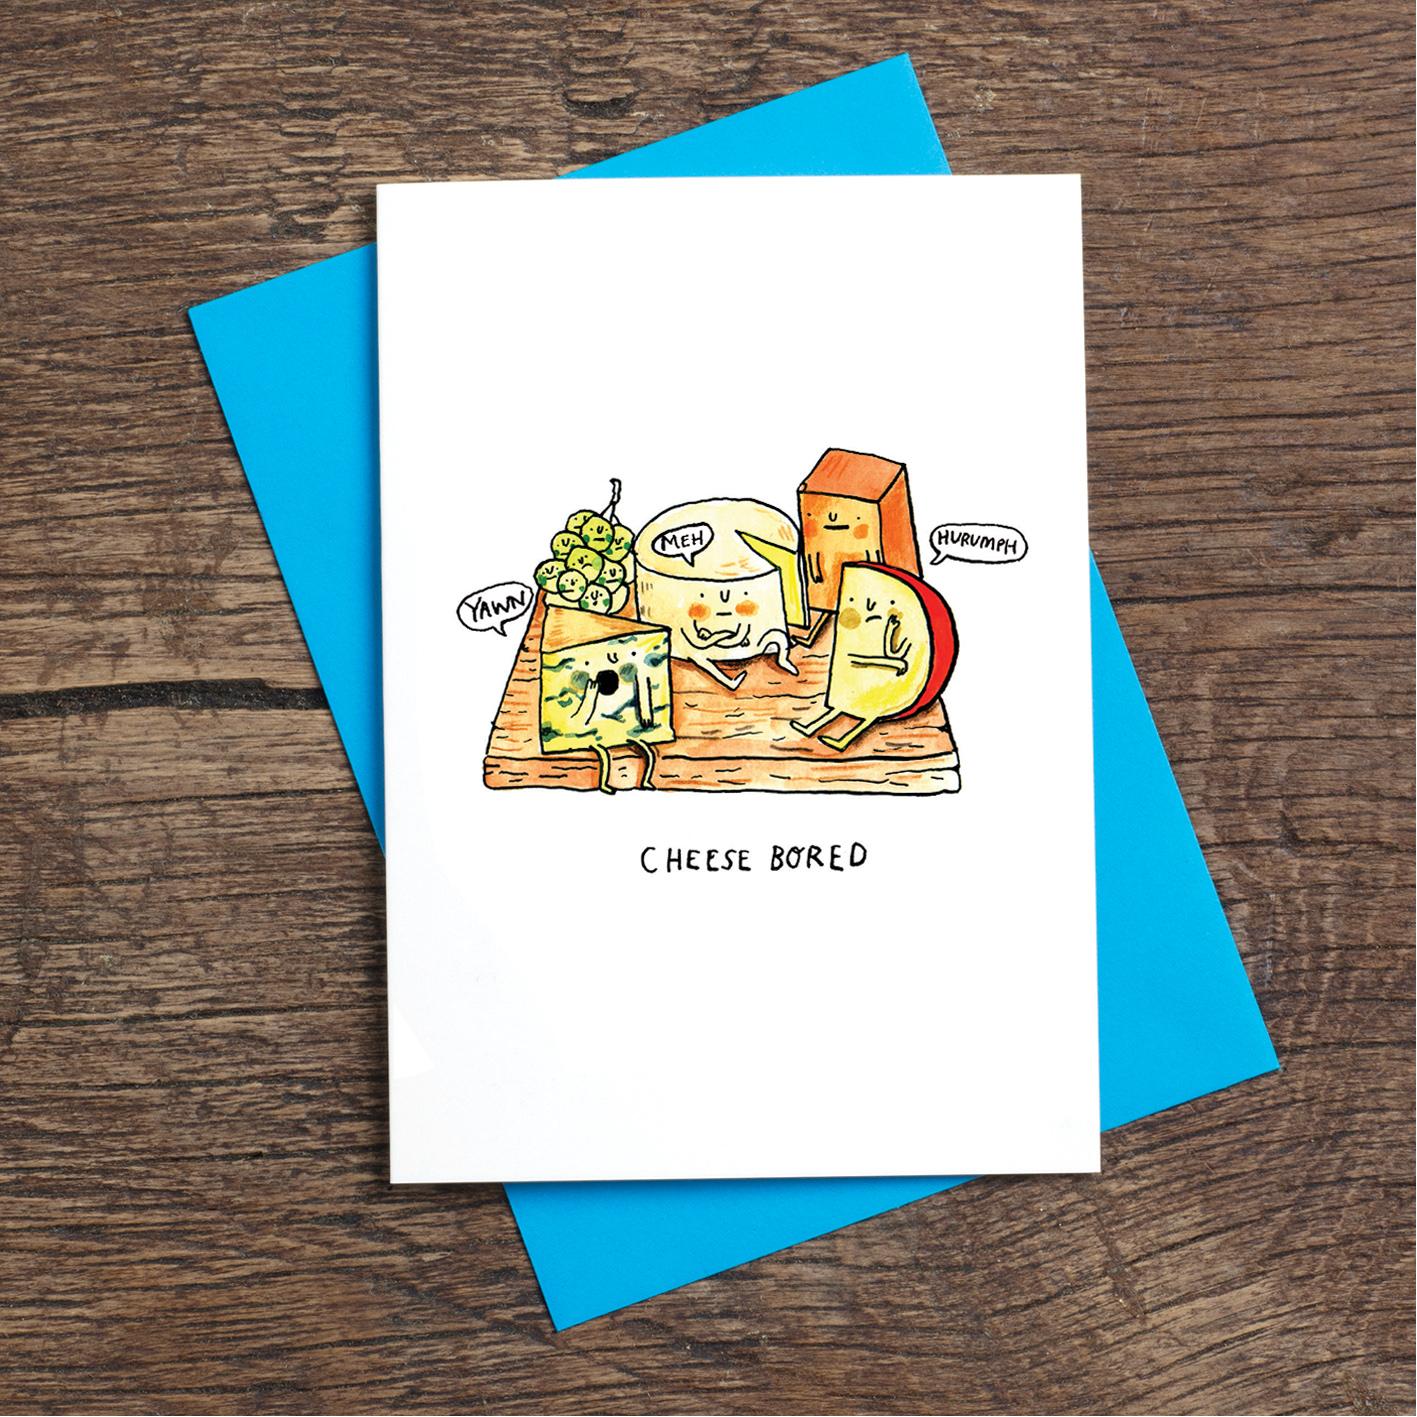 Cheese-Board_-Romantic-cheese-pun-greetings-card_SM69_FLC